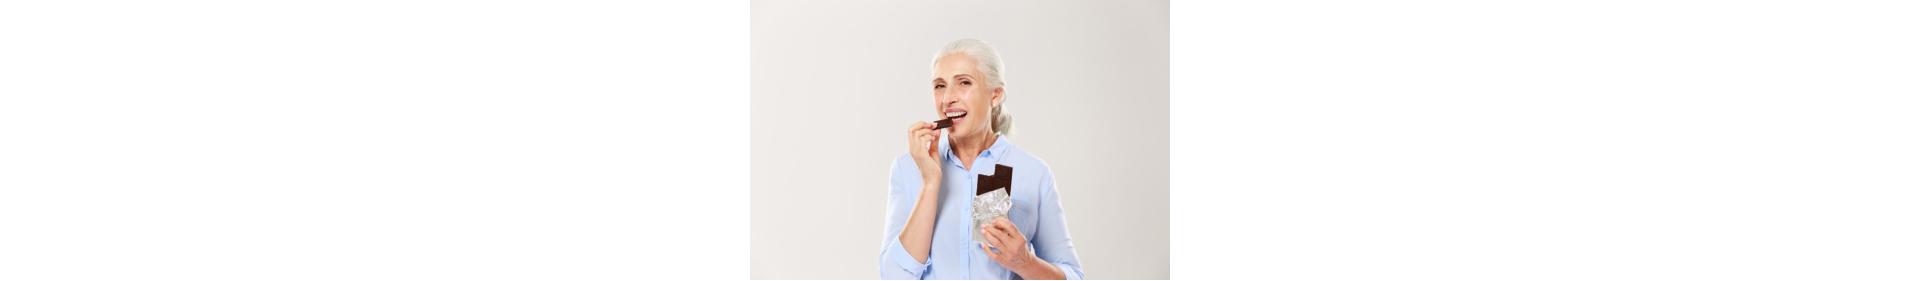 Portrait of cheerful elderly lady eating chocolate